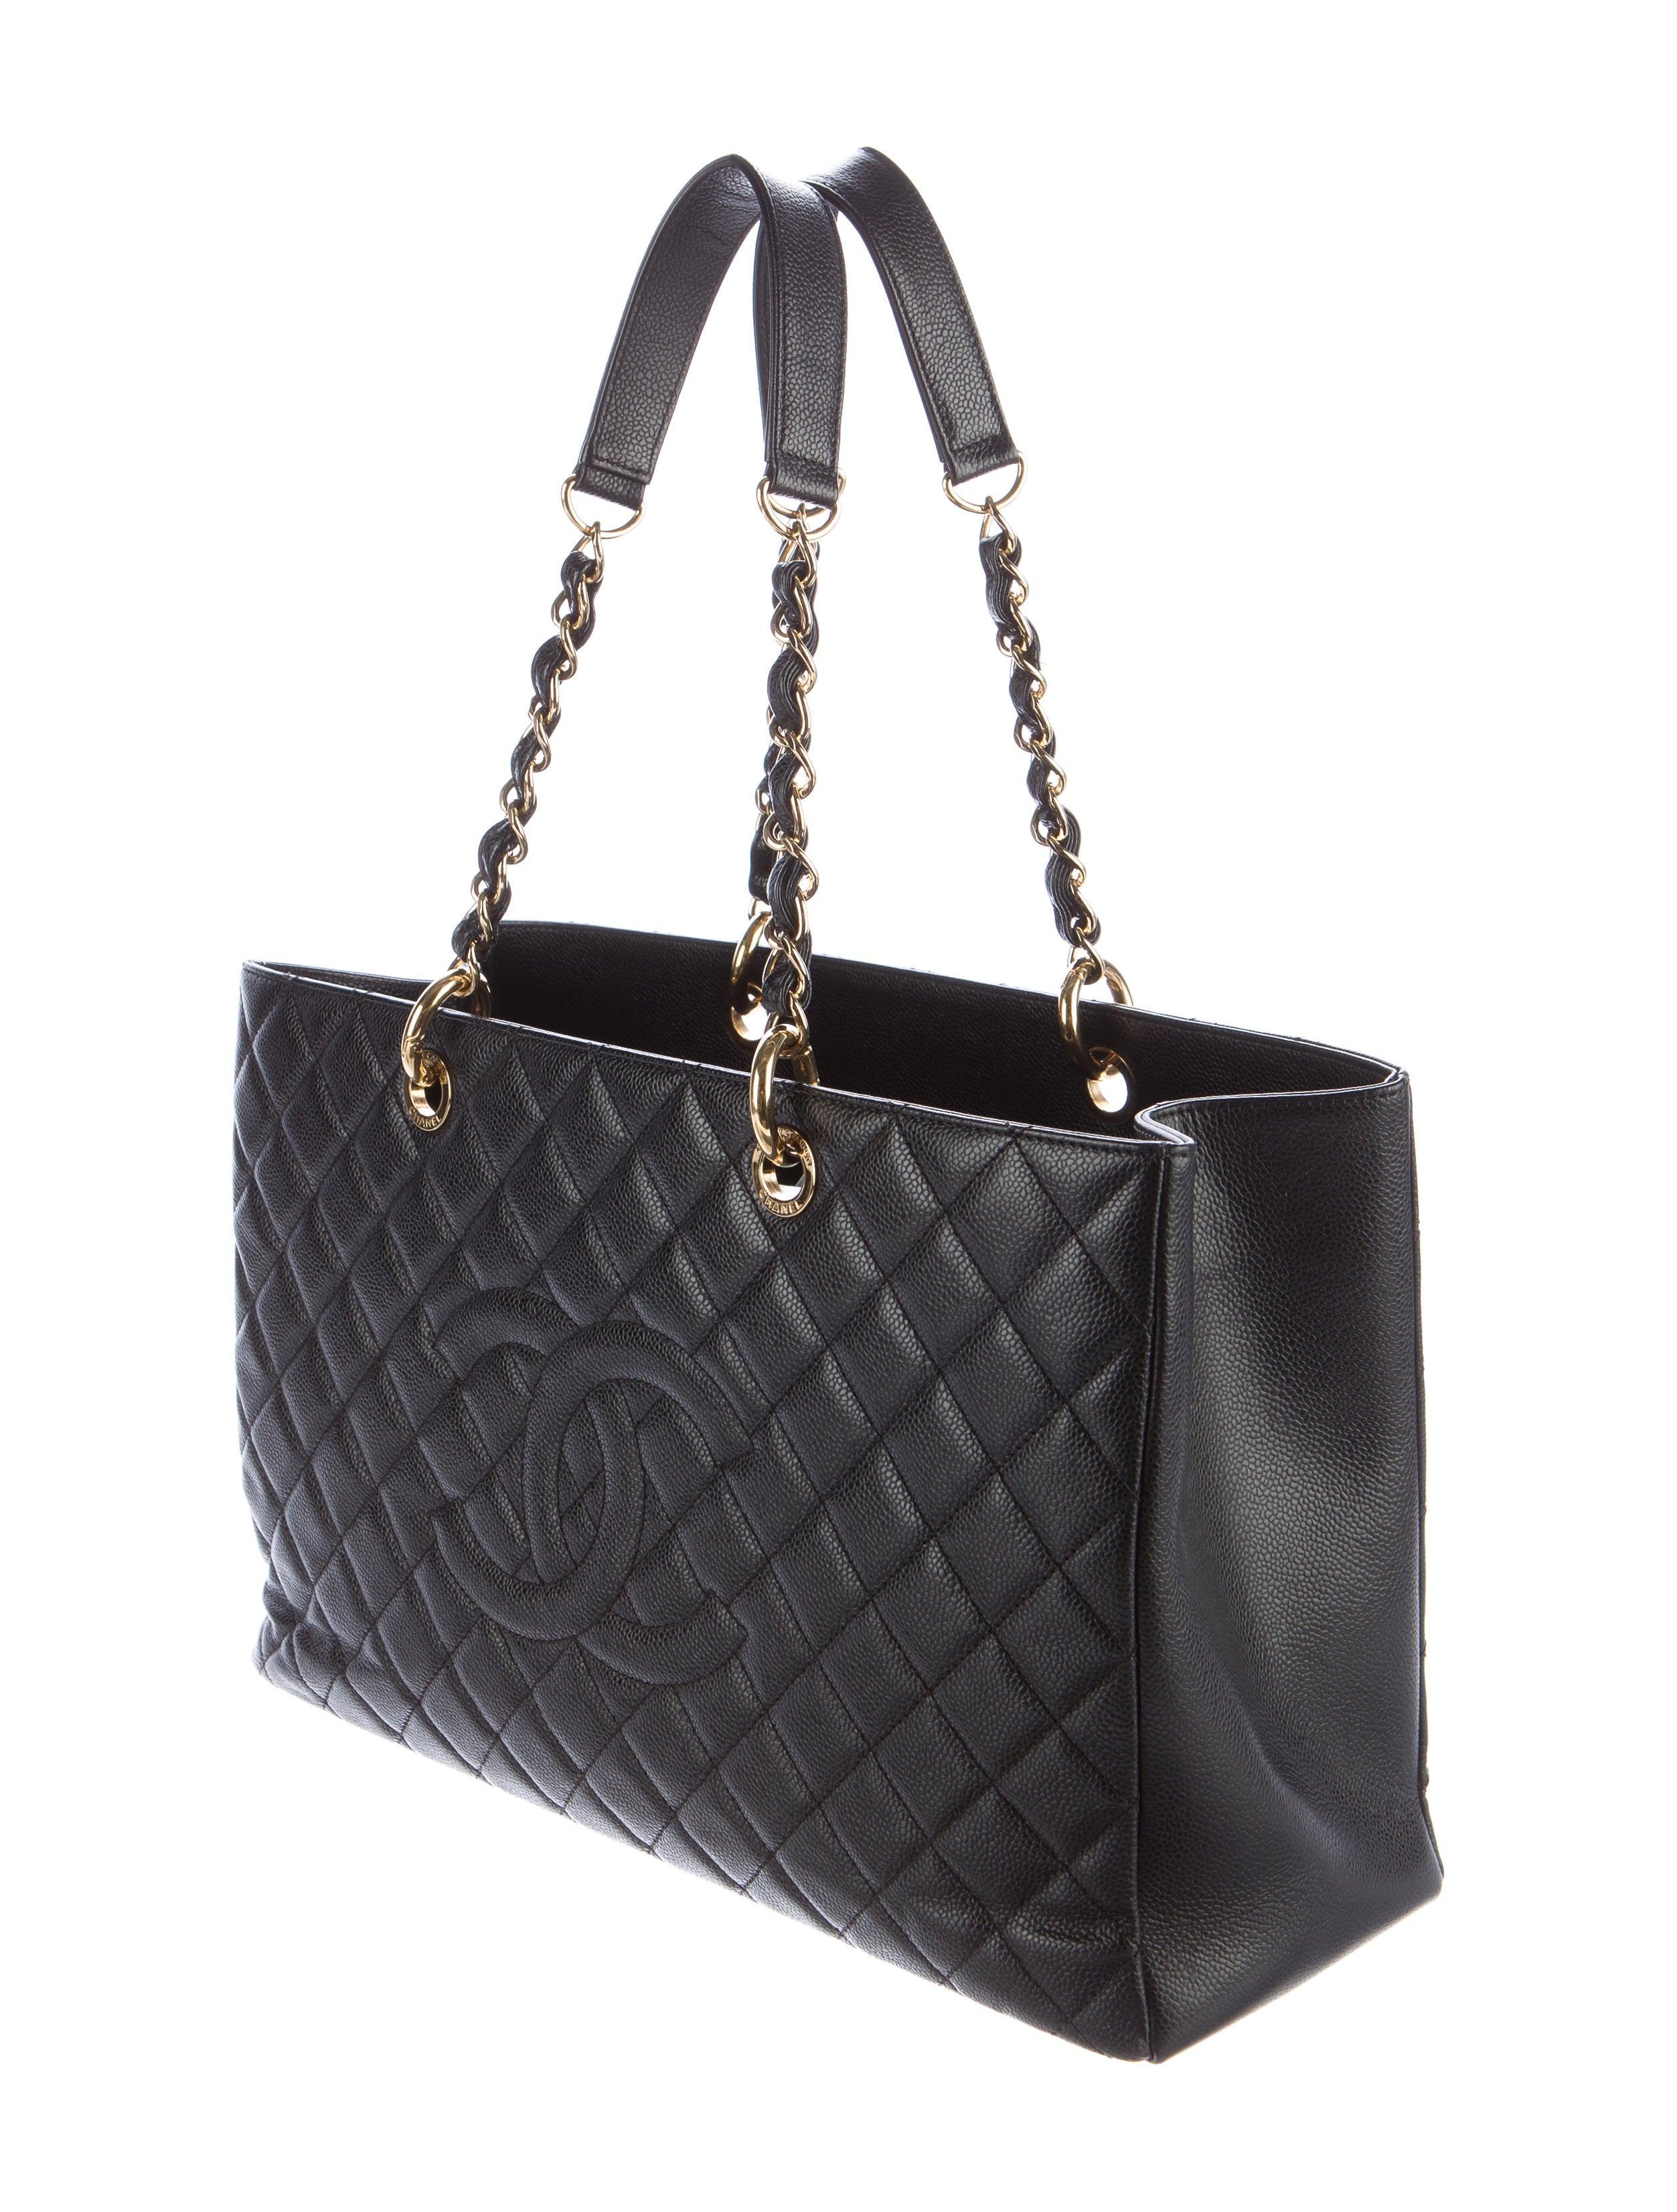 Chanel Caviar Xl Grand Shopping Tote Handbags